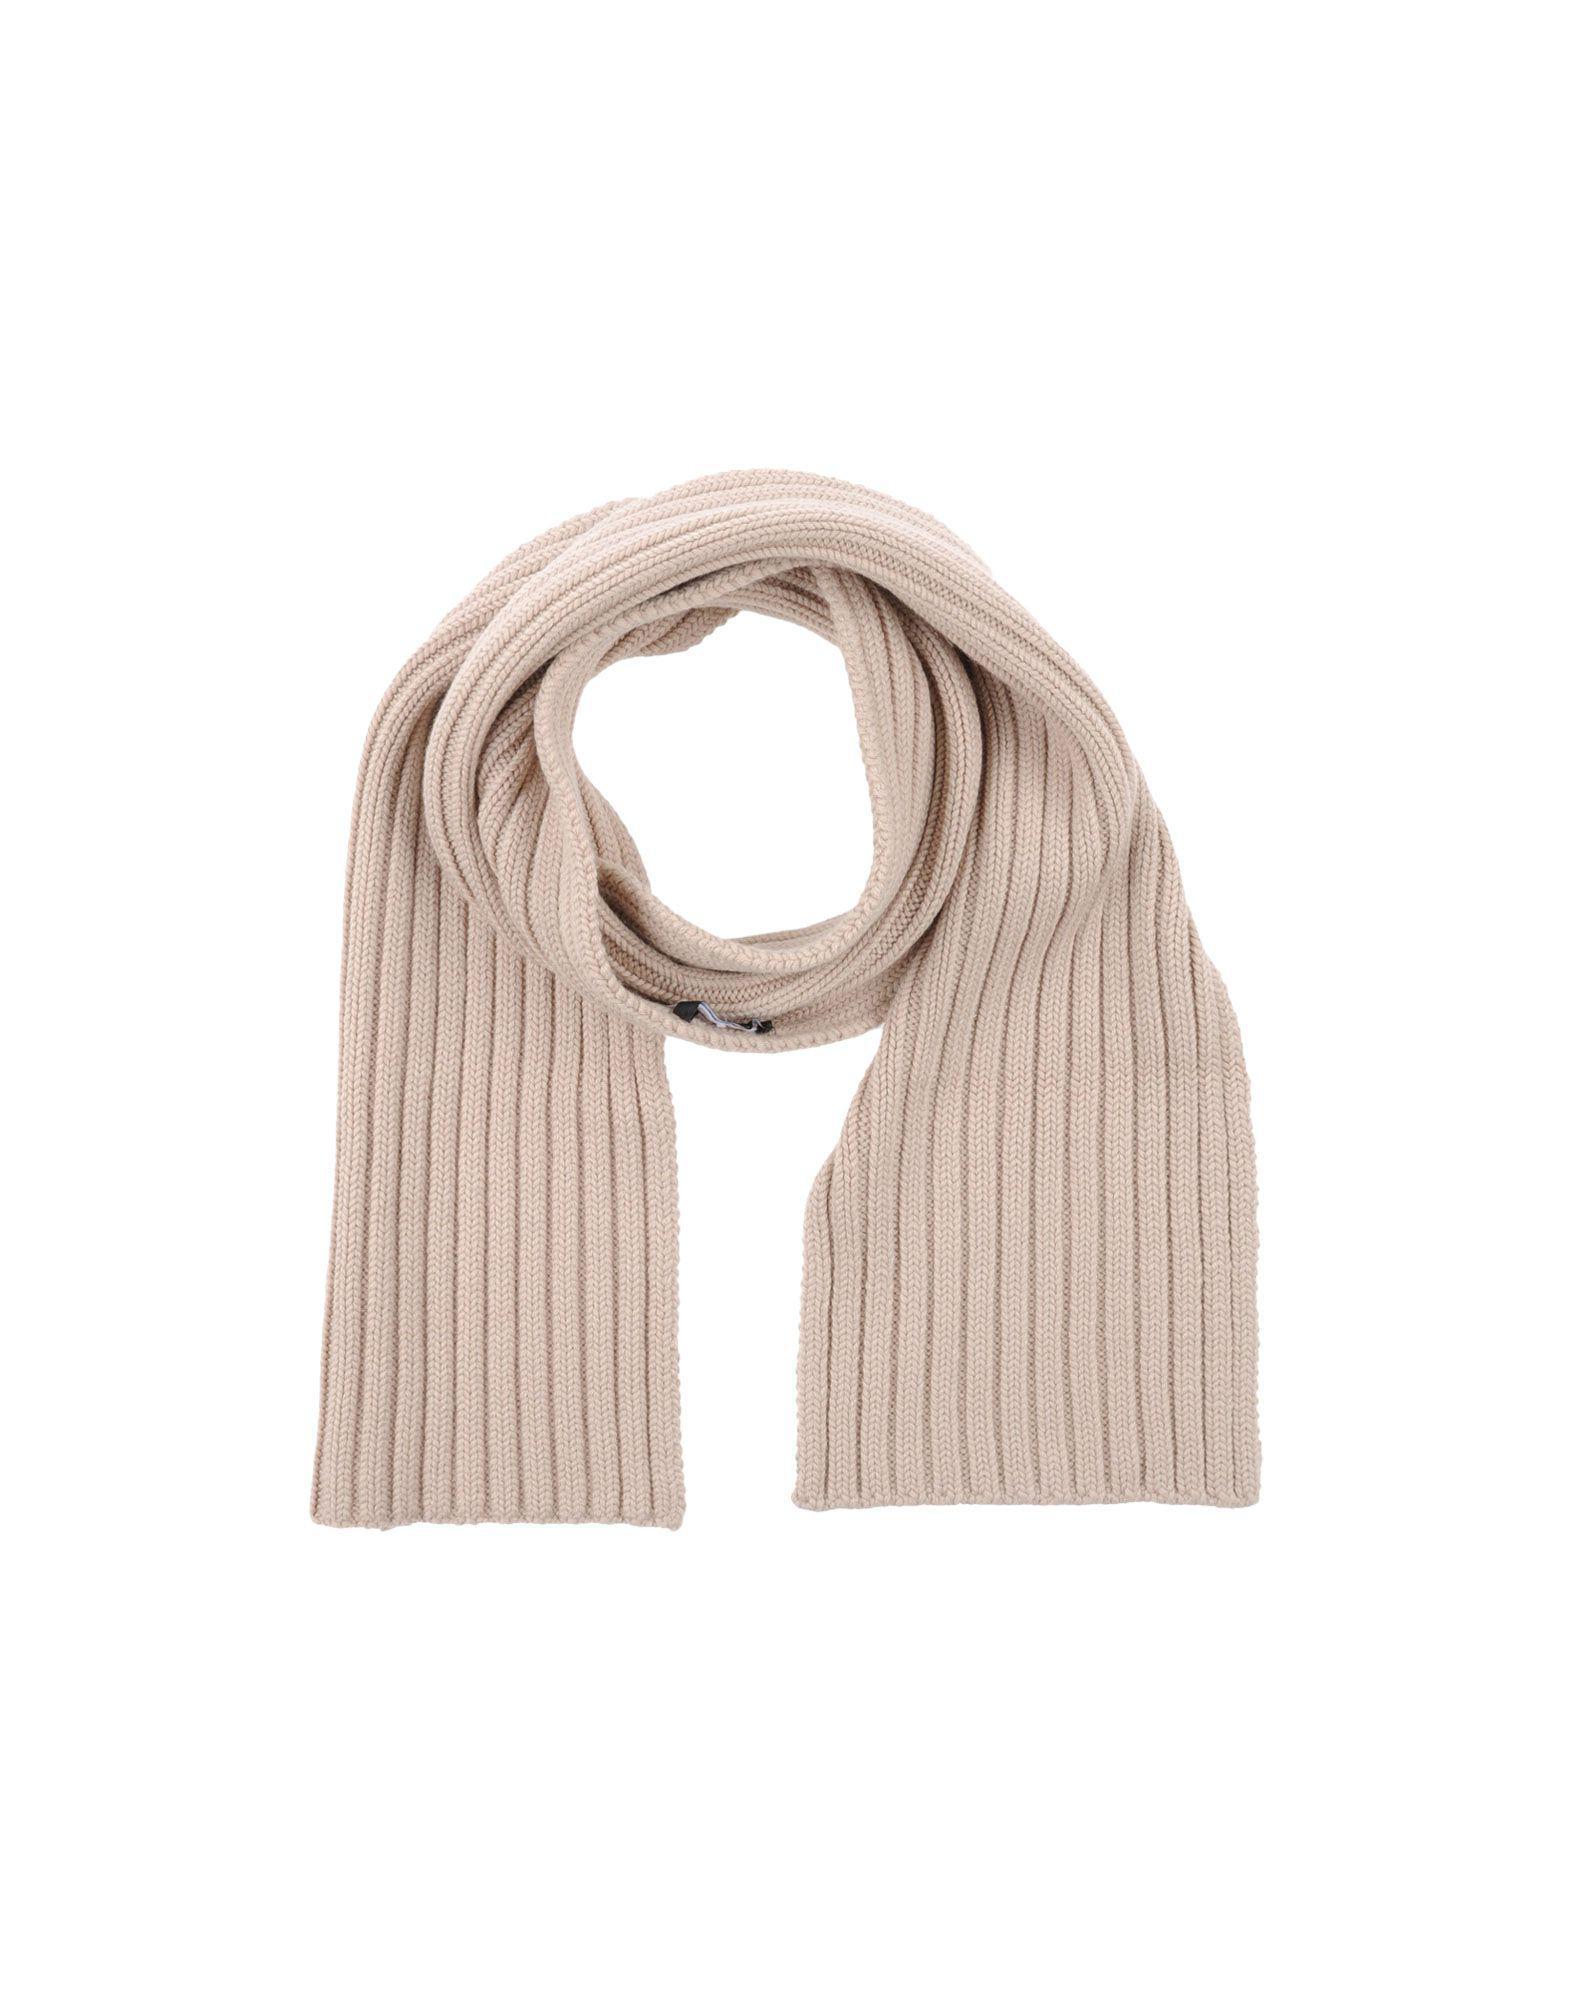 ACCESSORIES - Oblong scarves Paolo Errico fjv2e1